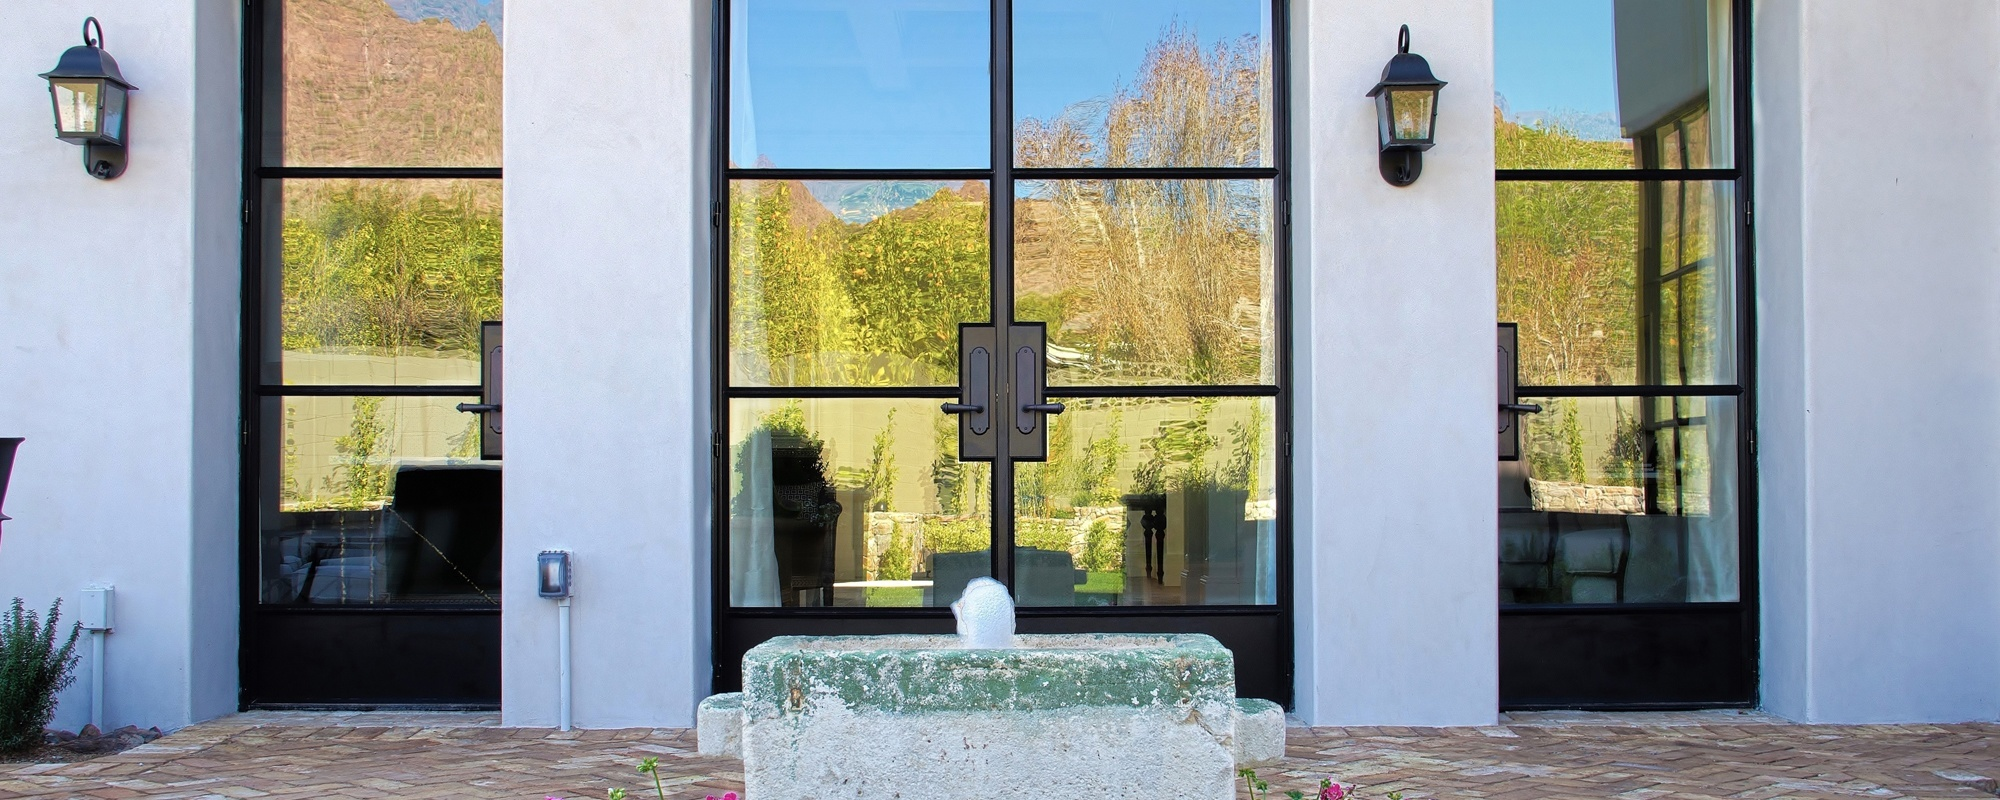 Elite custom supply high end masonry doors and windows for Custom windows and doors